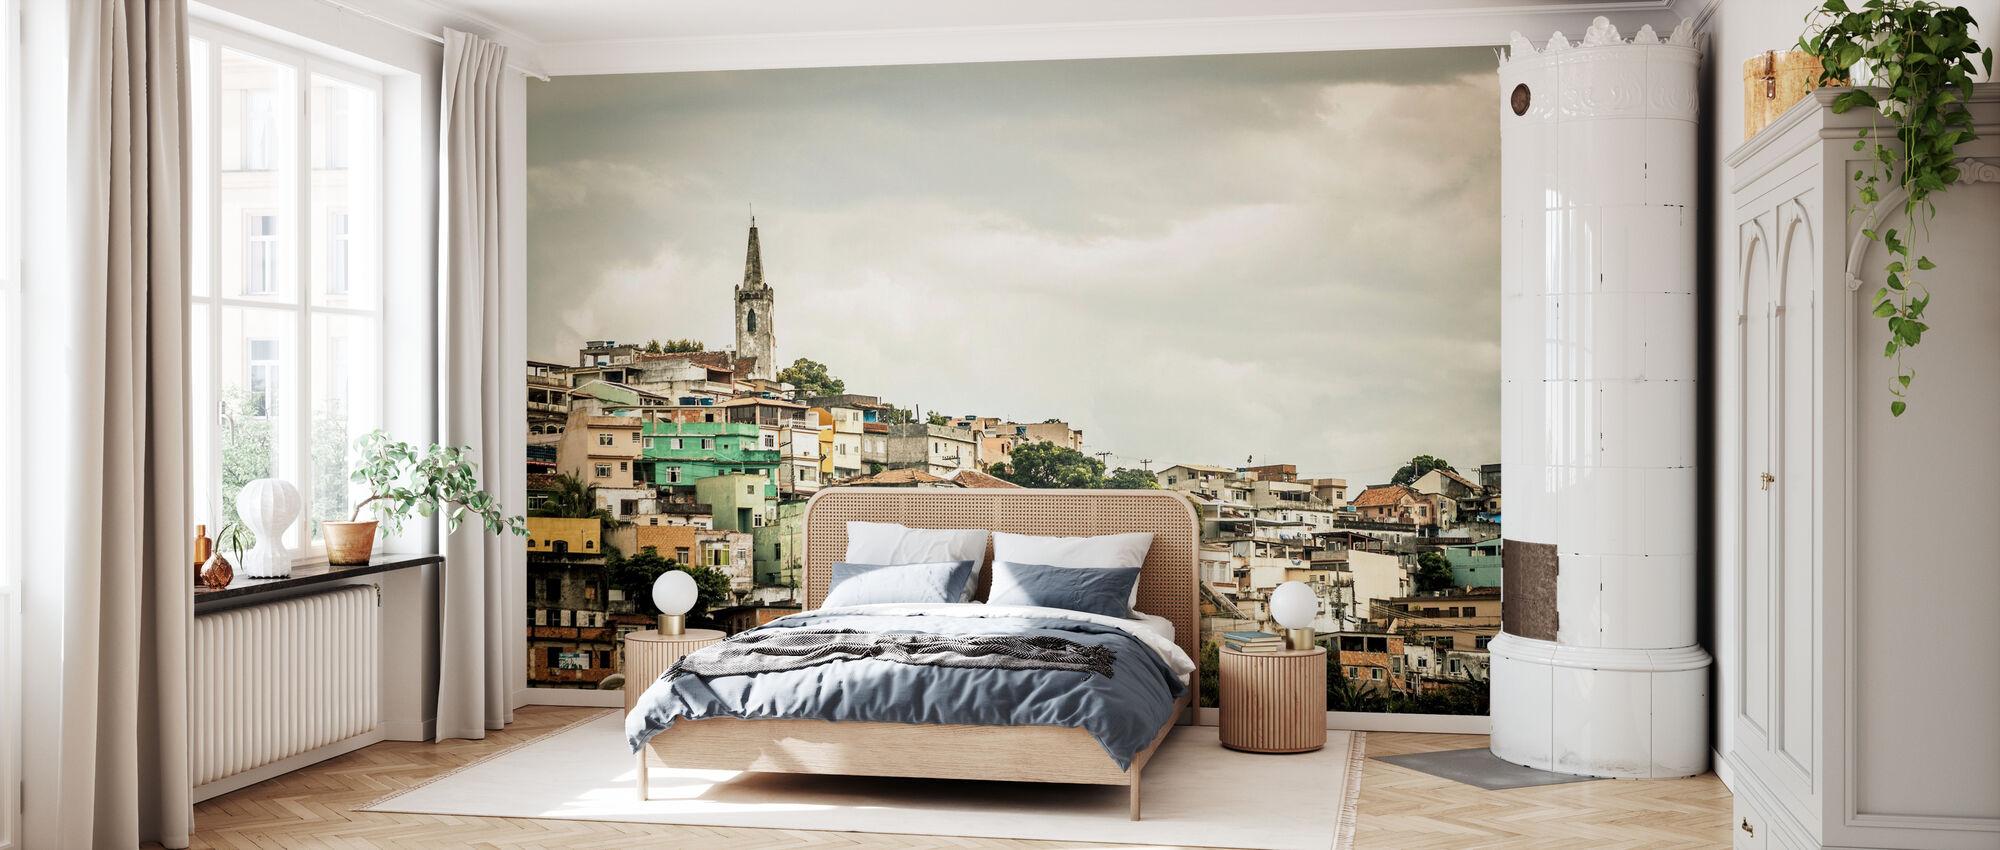 Hill River - Wallpaper - Bedroom